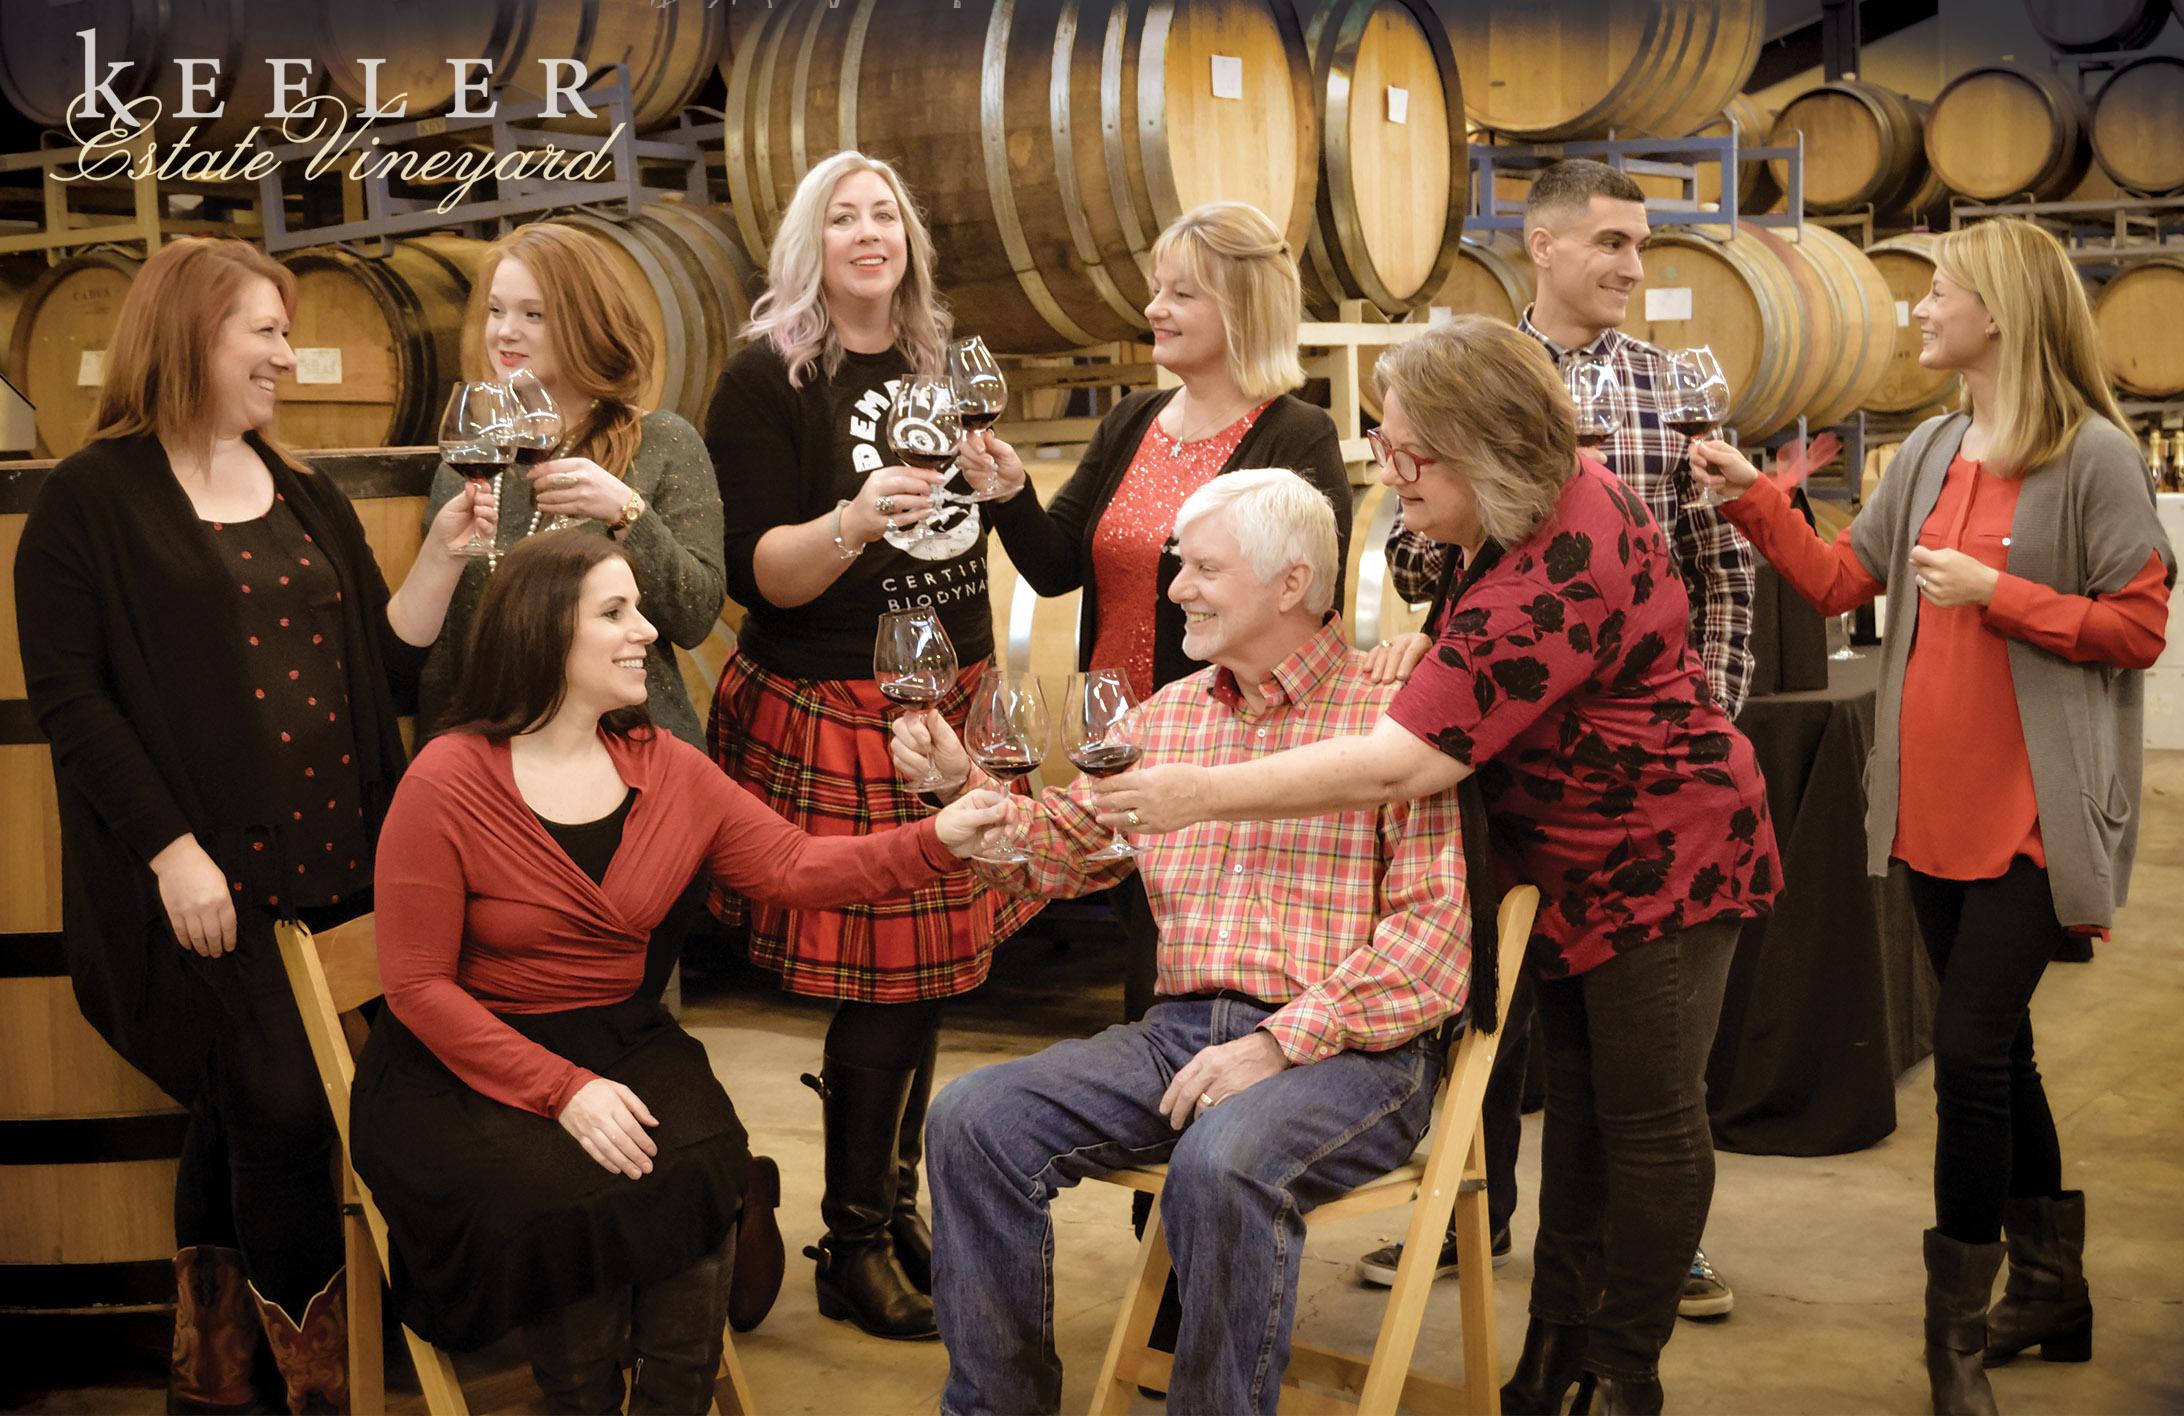 Keeler Estate Vineyard Team